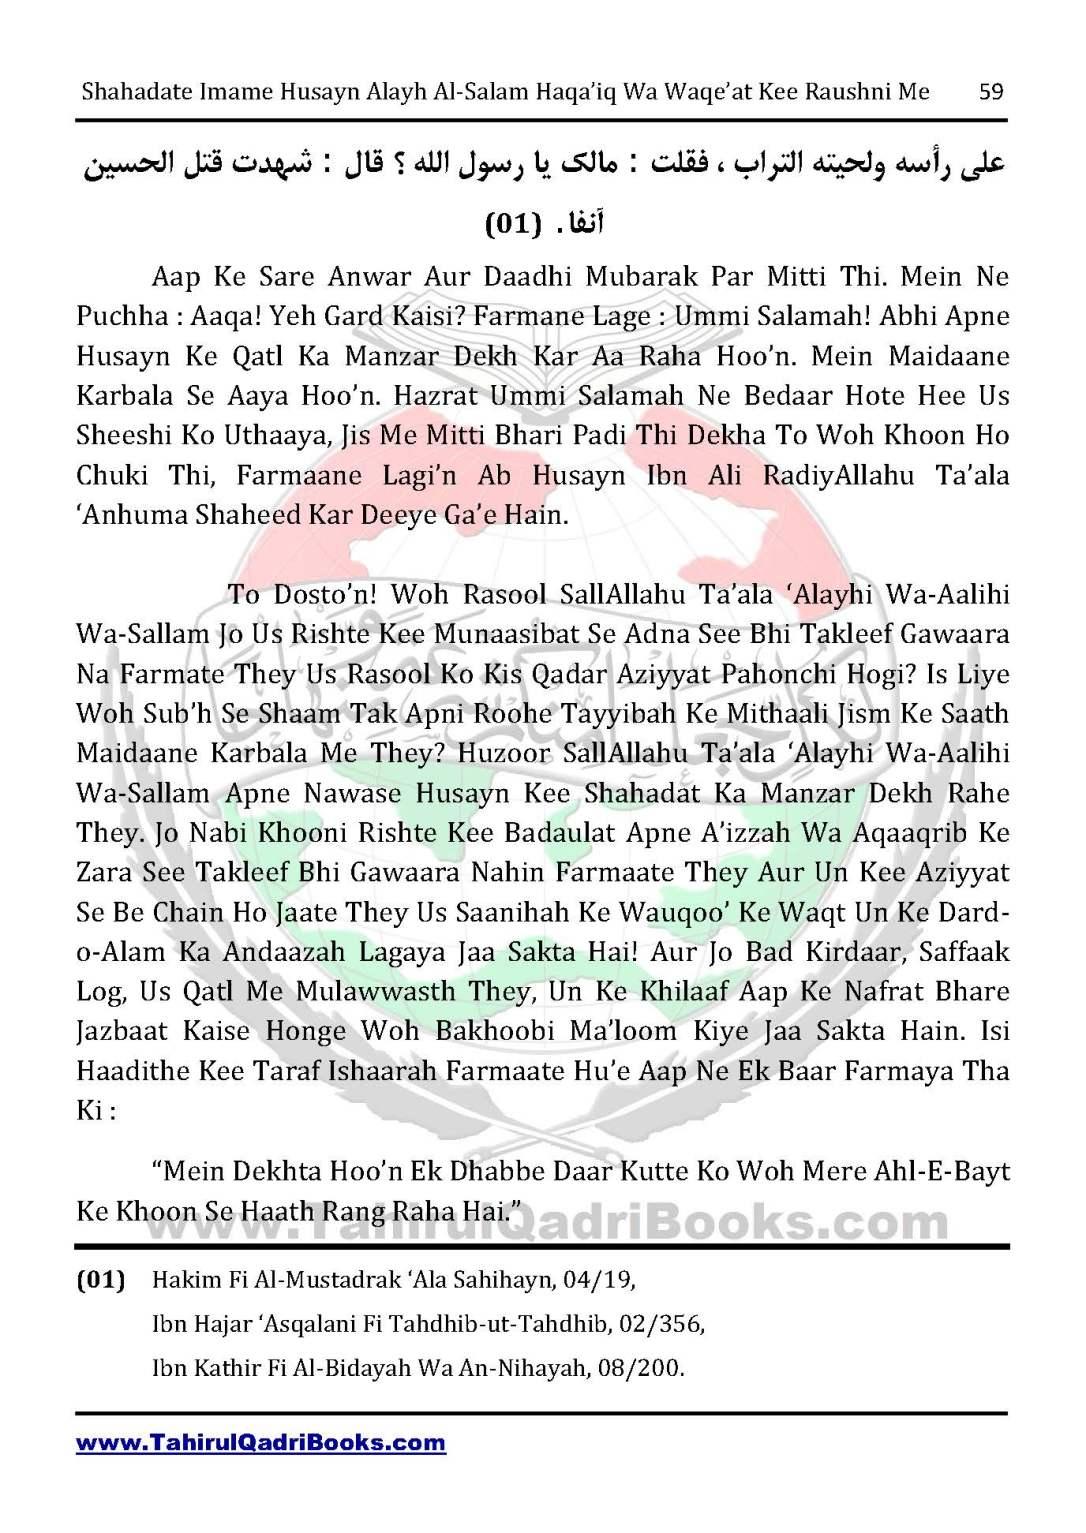 shahadate-imame-husayn-alayh-is-salam-haqaiq-wa-waqe_at-kee-raushni-me-in-roman-urdu-unlocked_Page_59